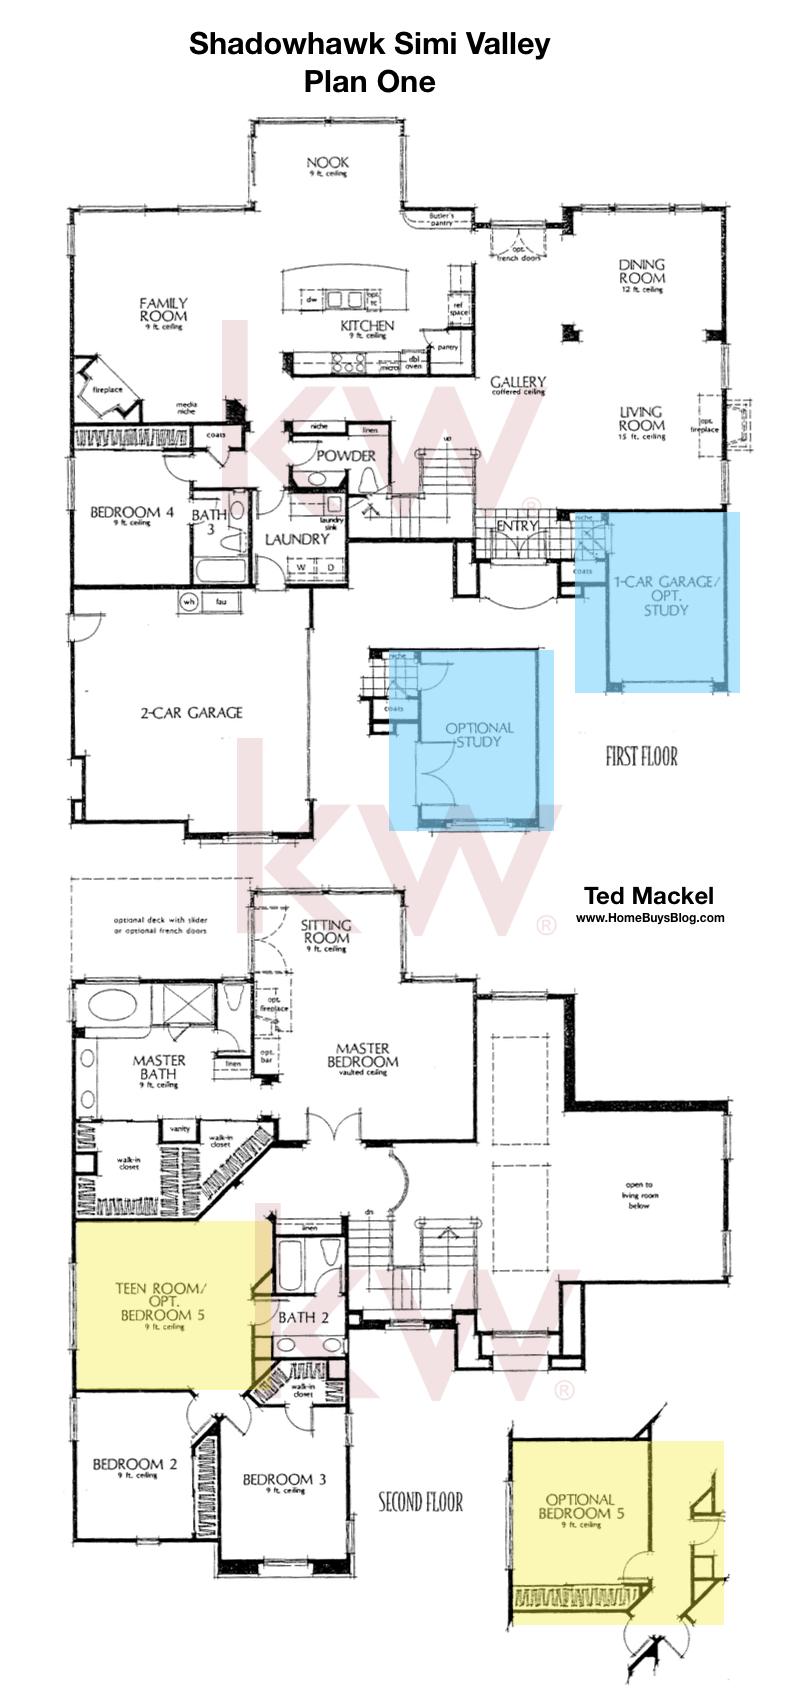 Shadowhawk Plan 1 Simi Valley Floor Plan